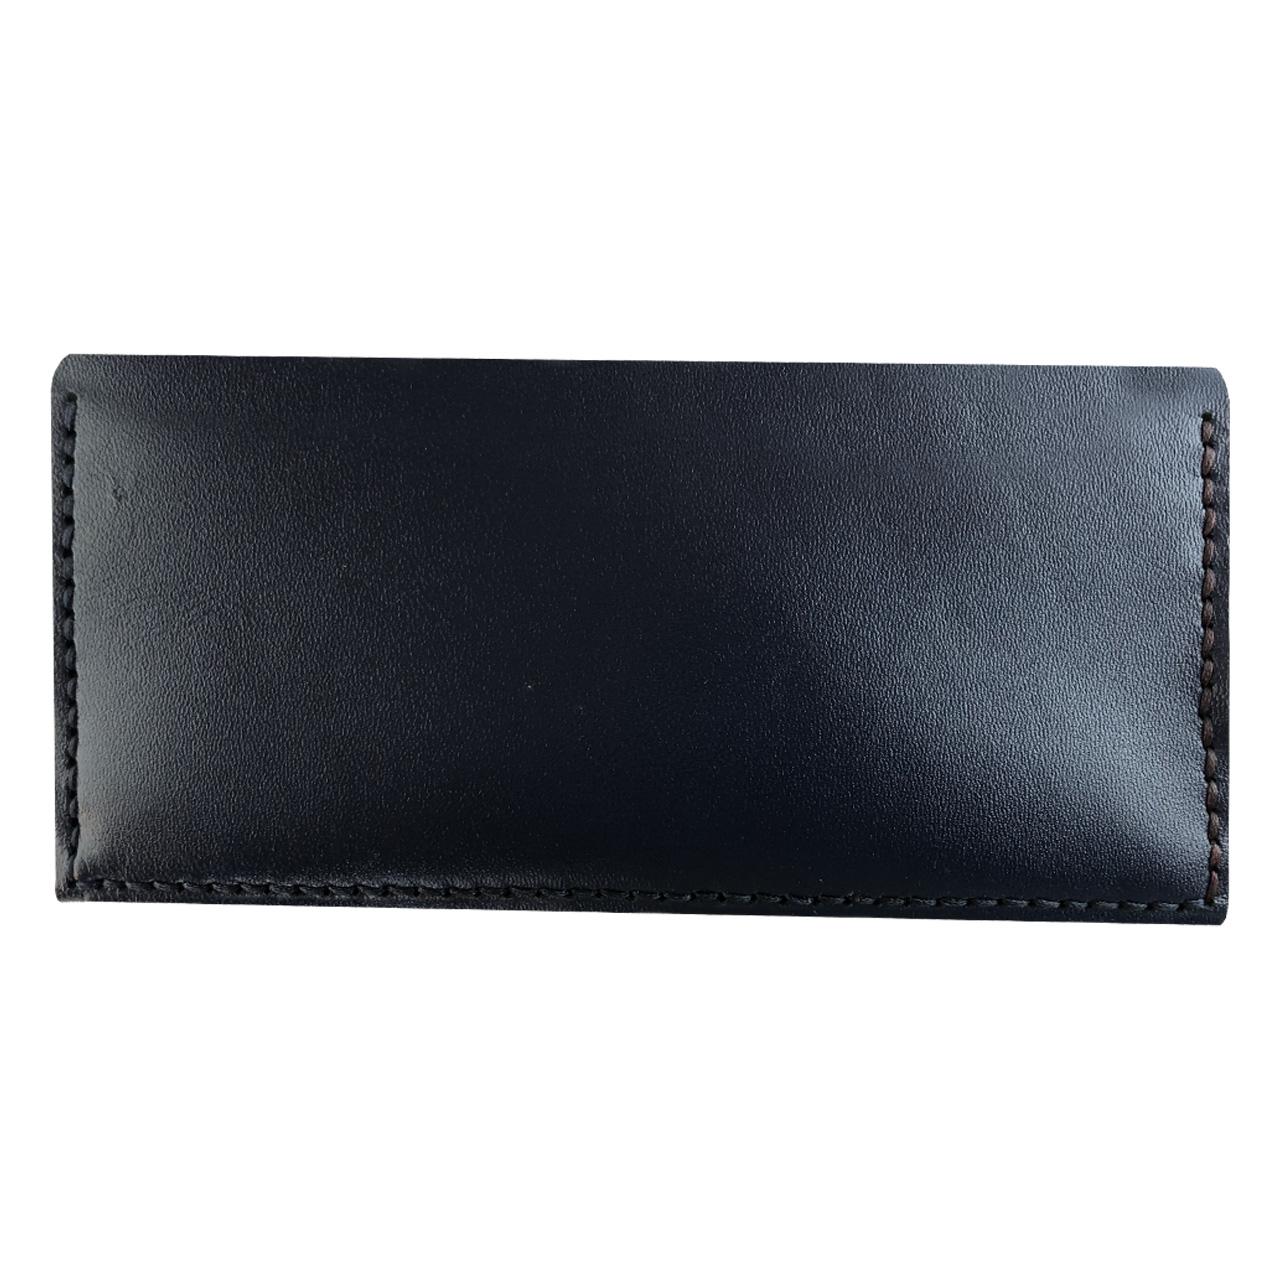 کیف پول چرم طبیعی ای دی گالری مدل T10-BN